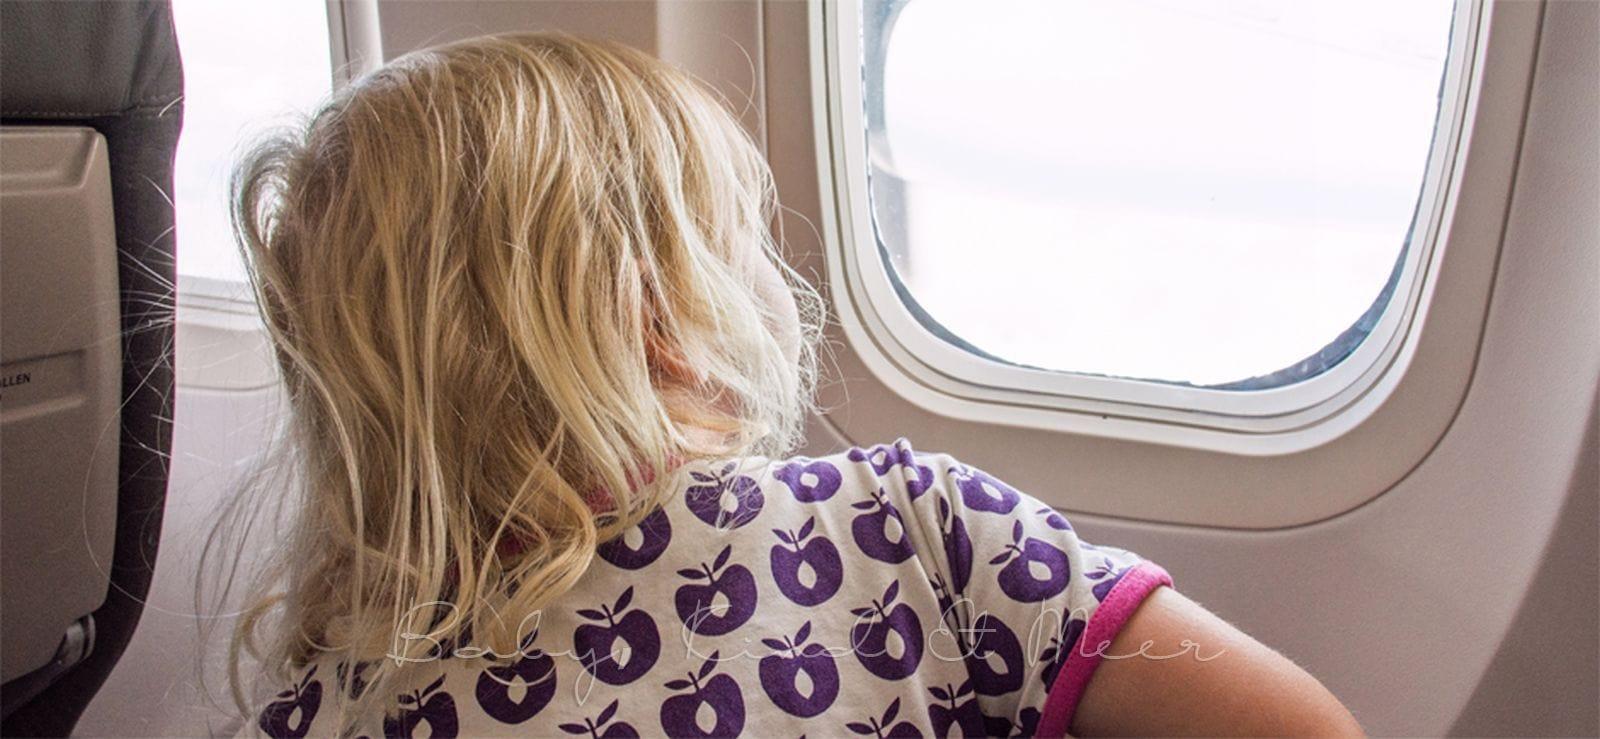 ohrendruck nach flug geht nicht weg